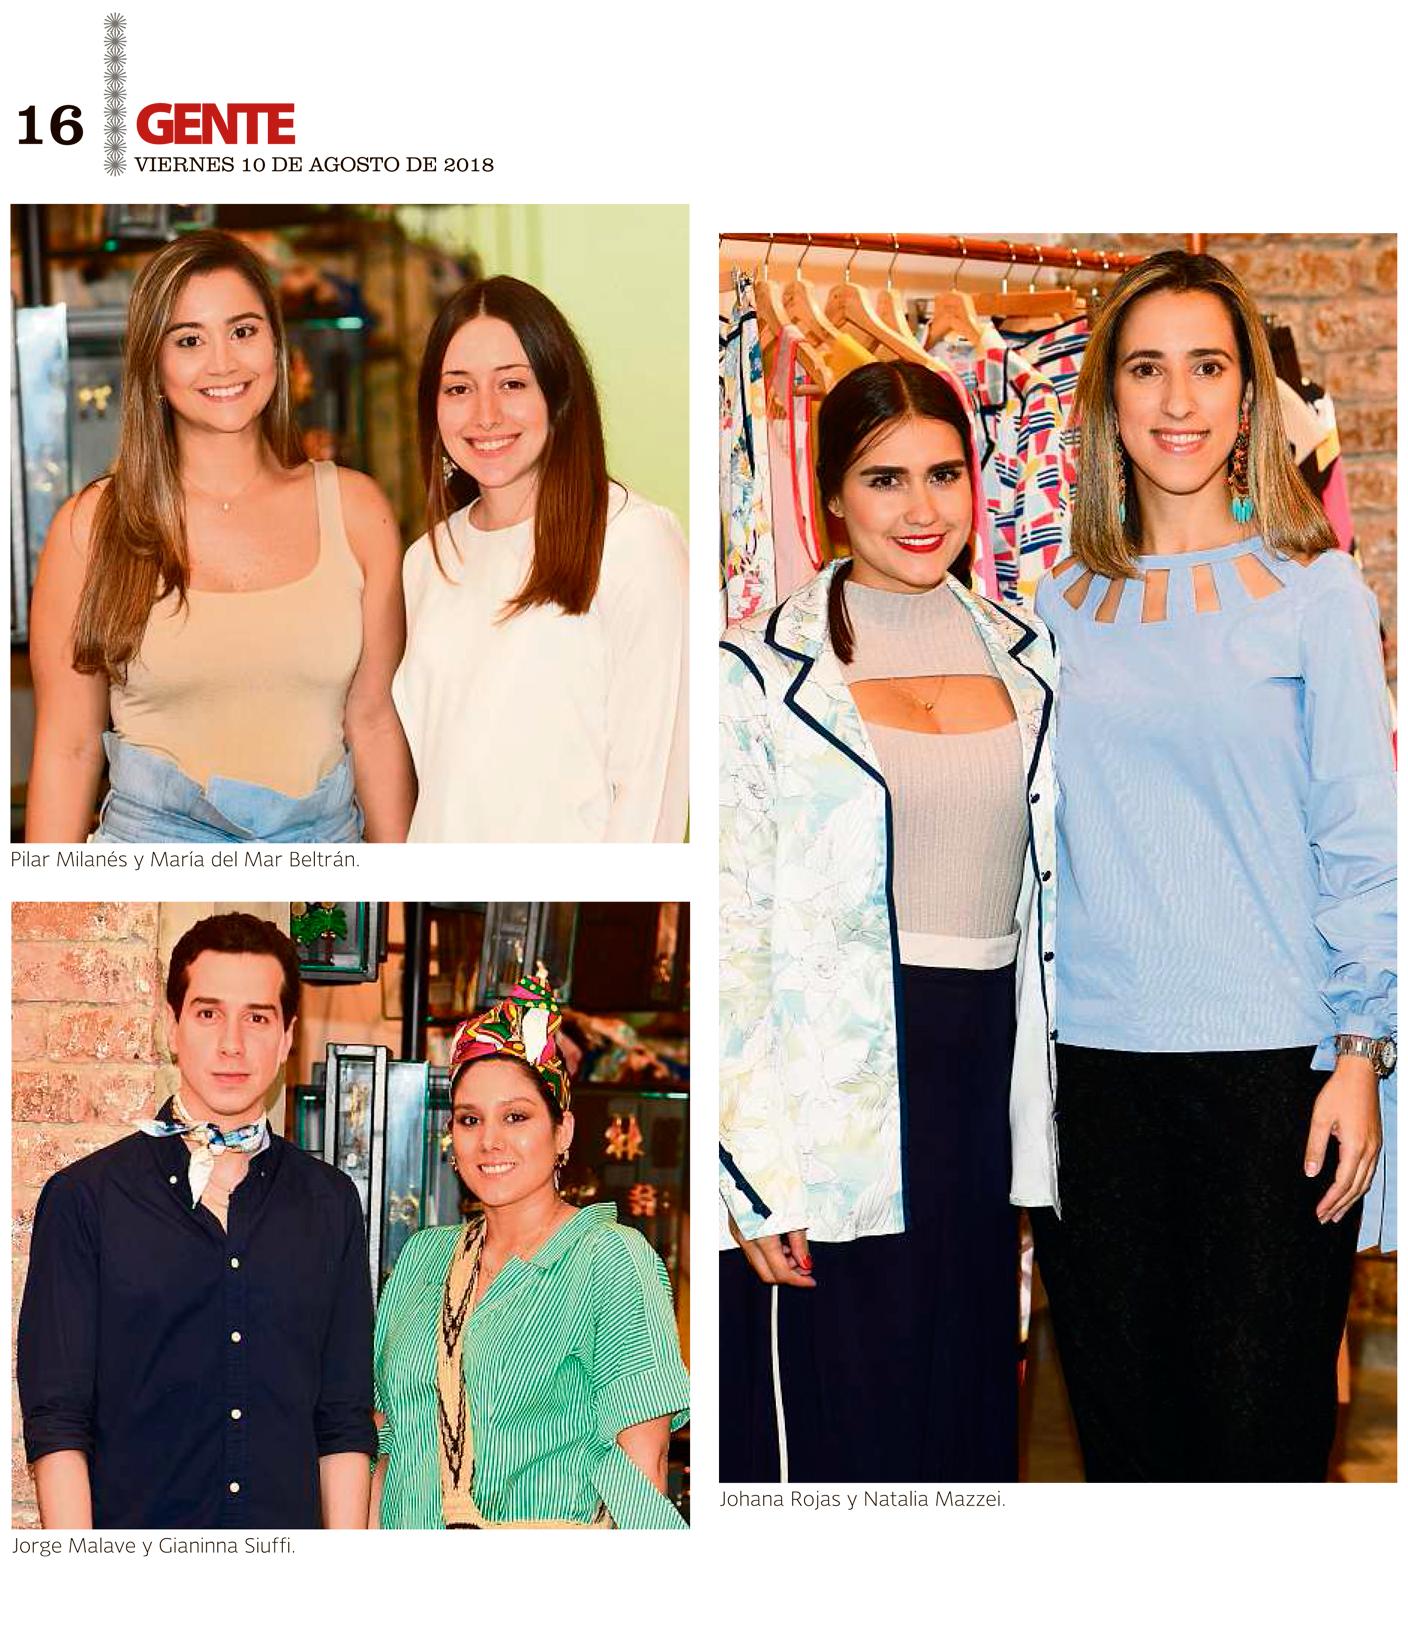 Revista GENTE - Agosto 2018